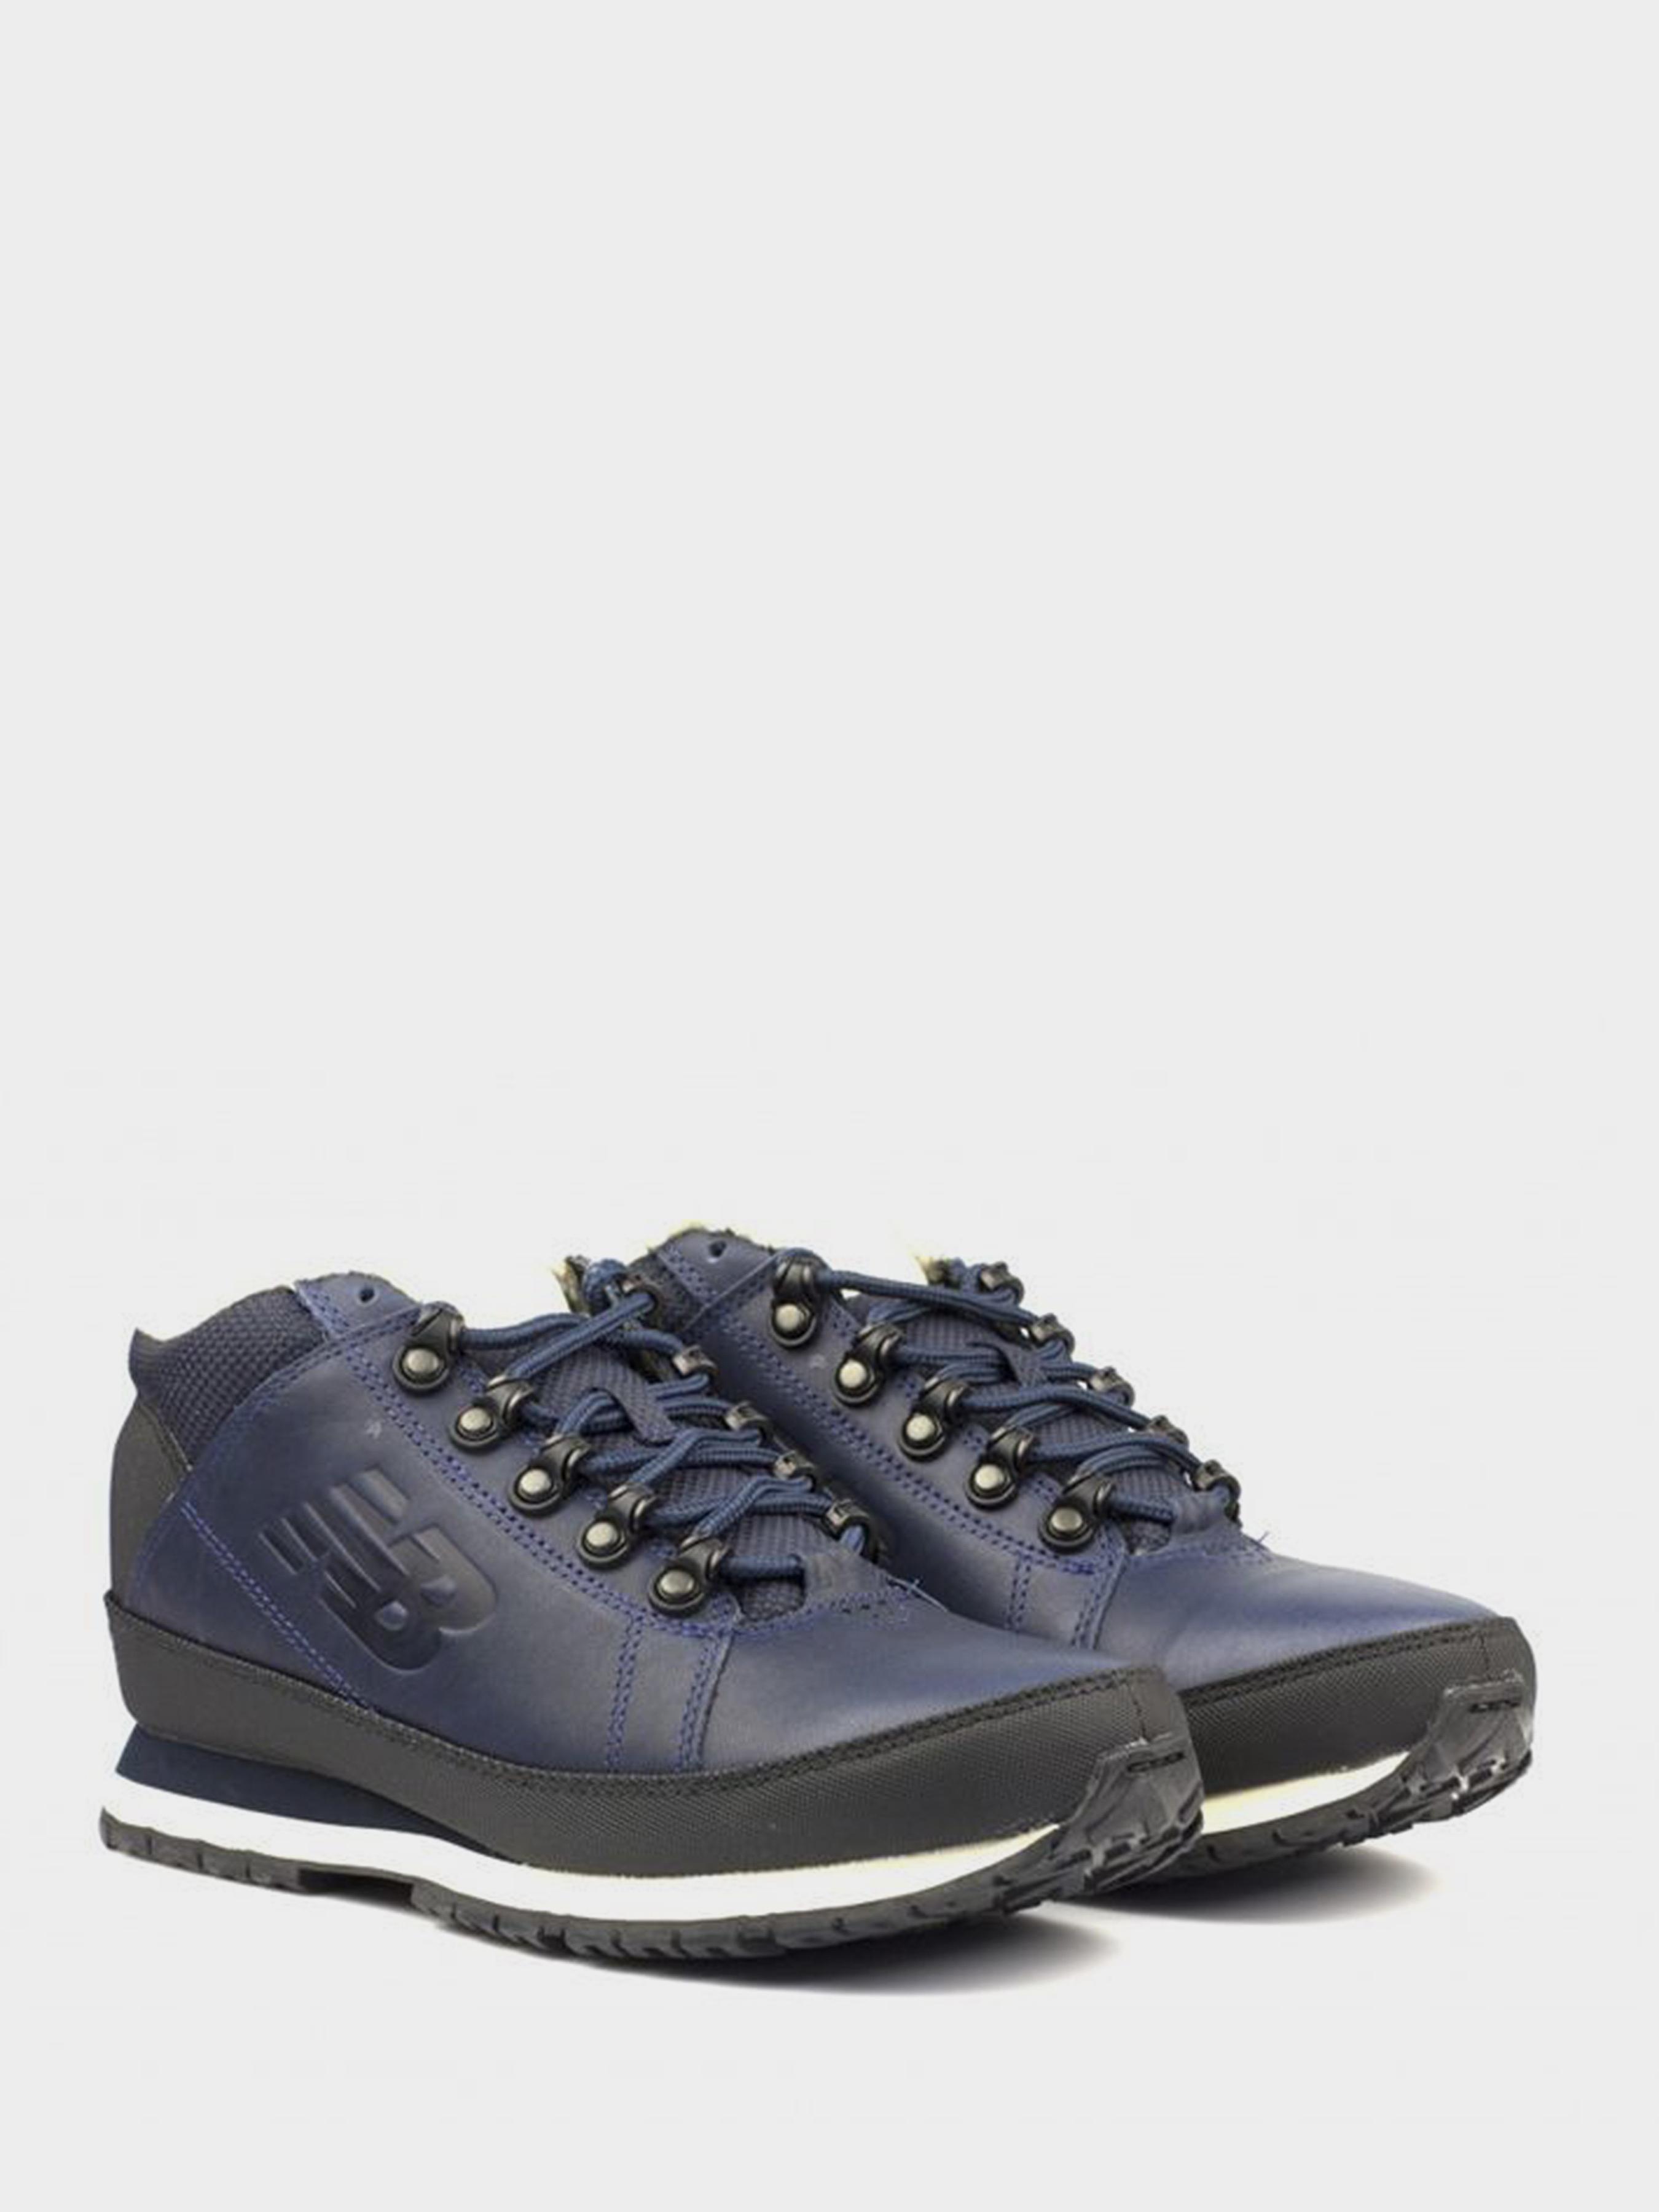 Кроссовки для мужчин New Balance 754 MQ32 размерная сетка обуви, 2017